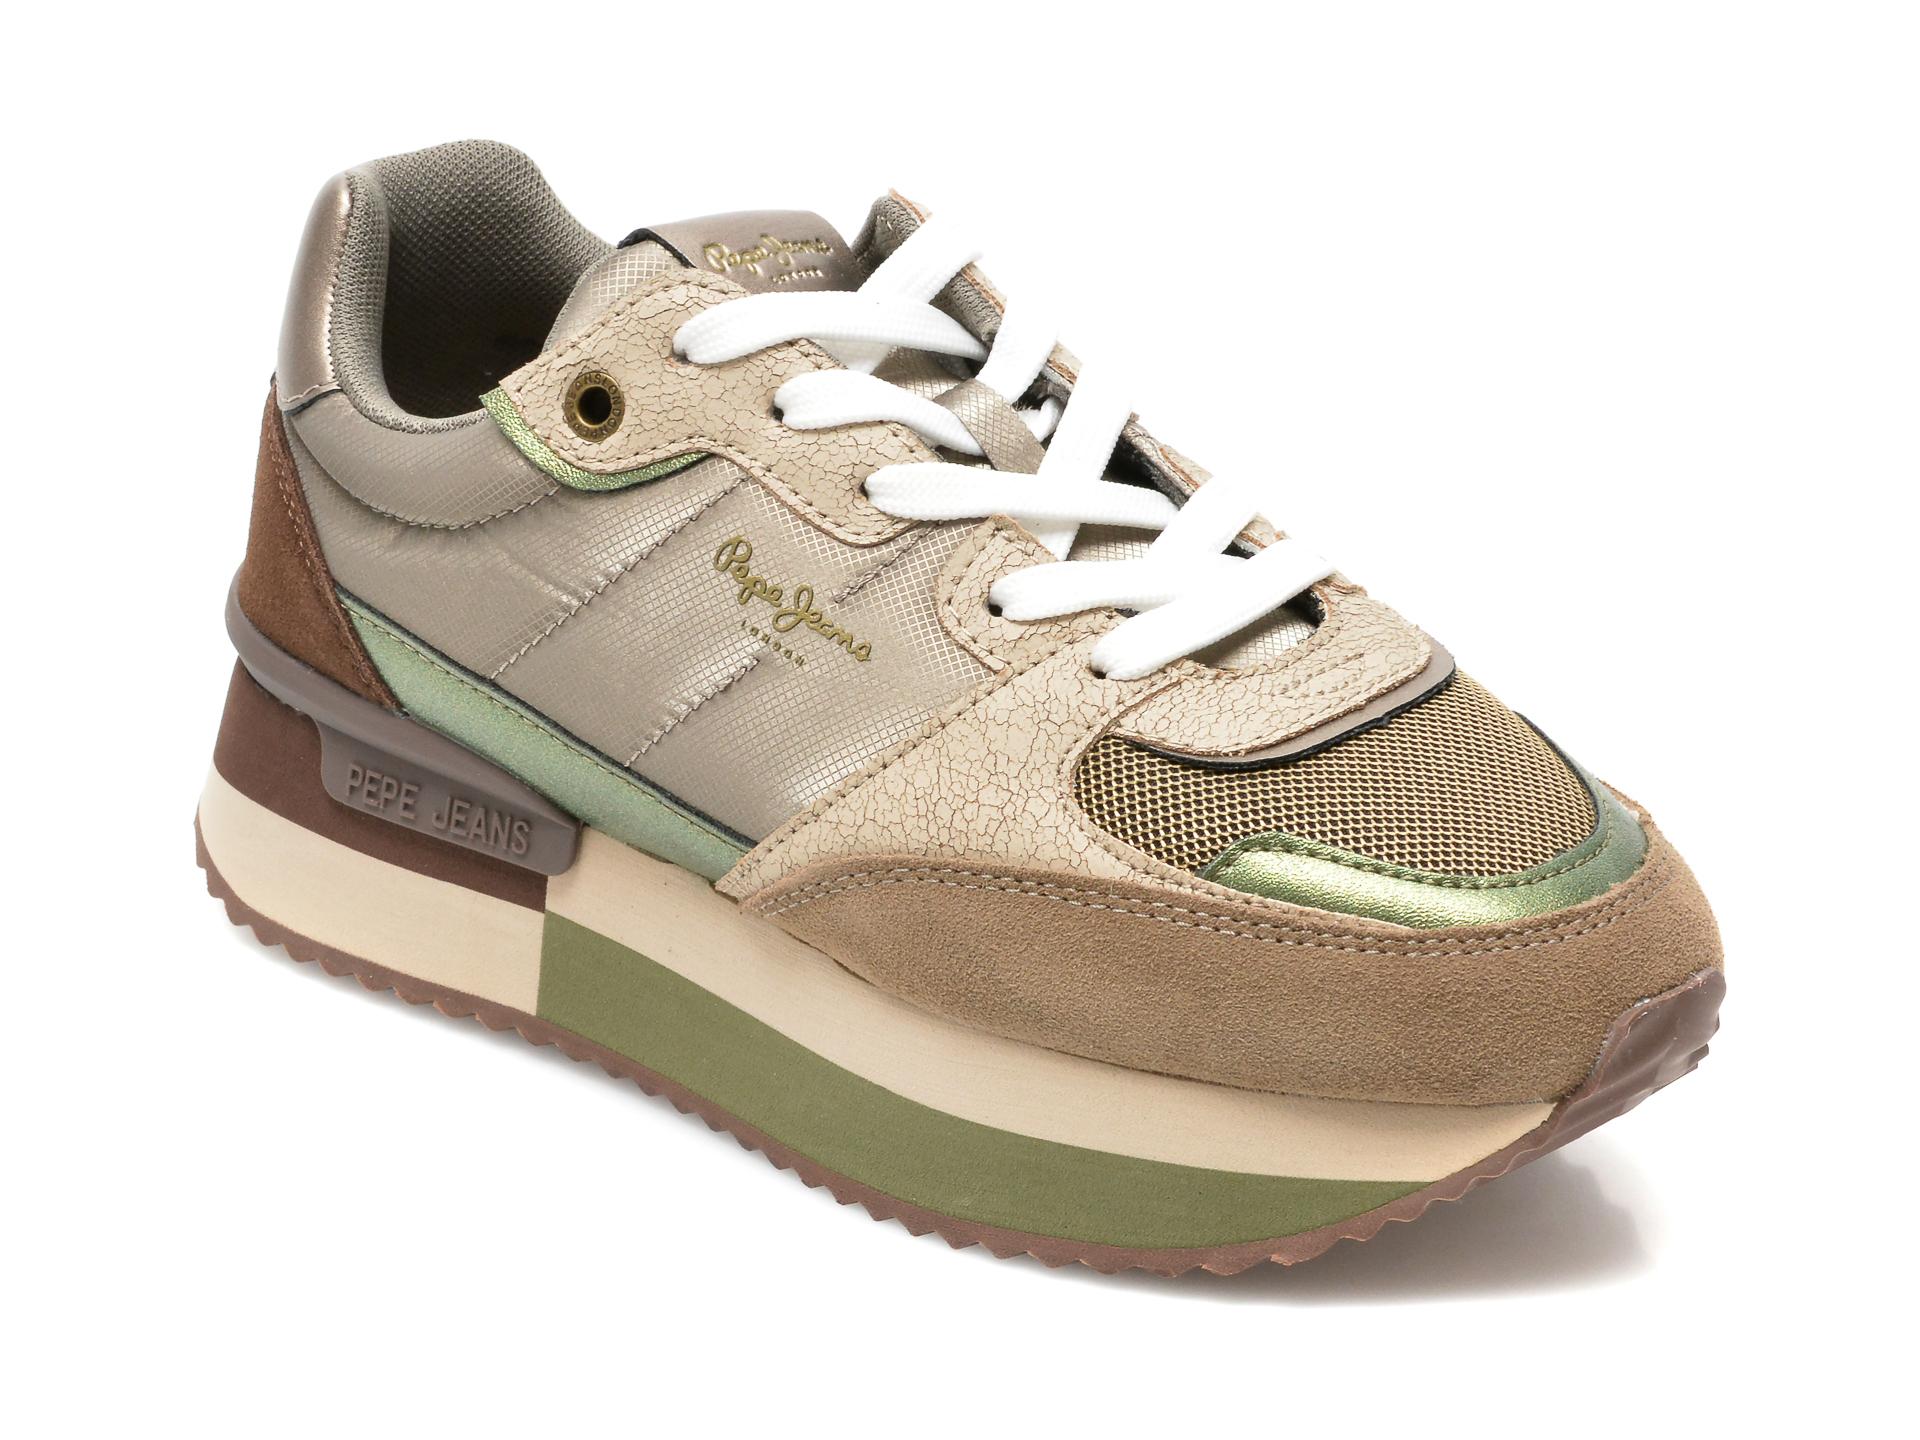 Pantofi sport PEPE JEANS gri, LS31259, din material textil si piele naturala